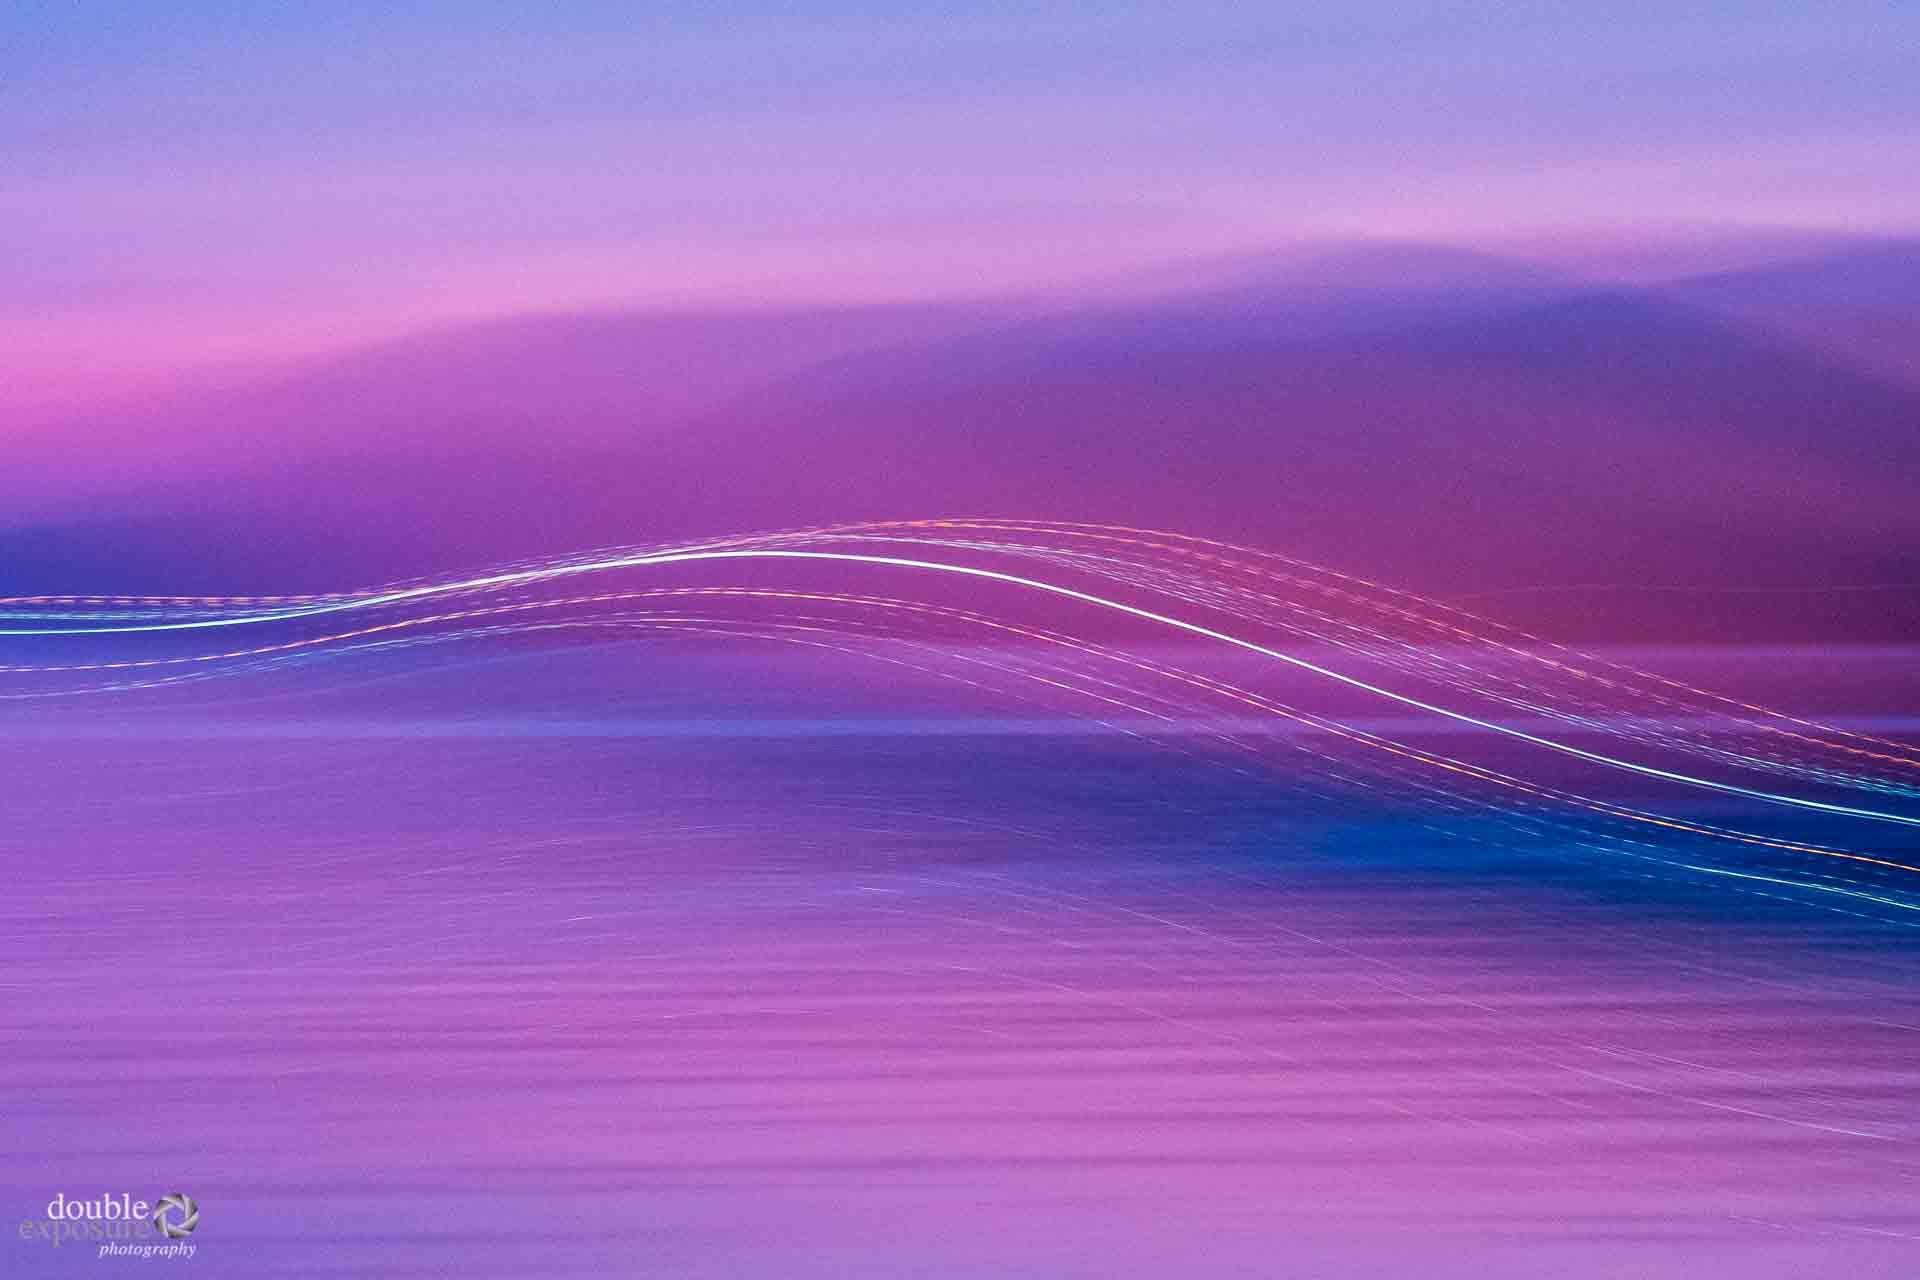 camera motion creates streaks of sunset light.